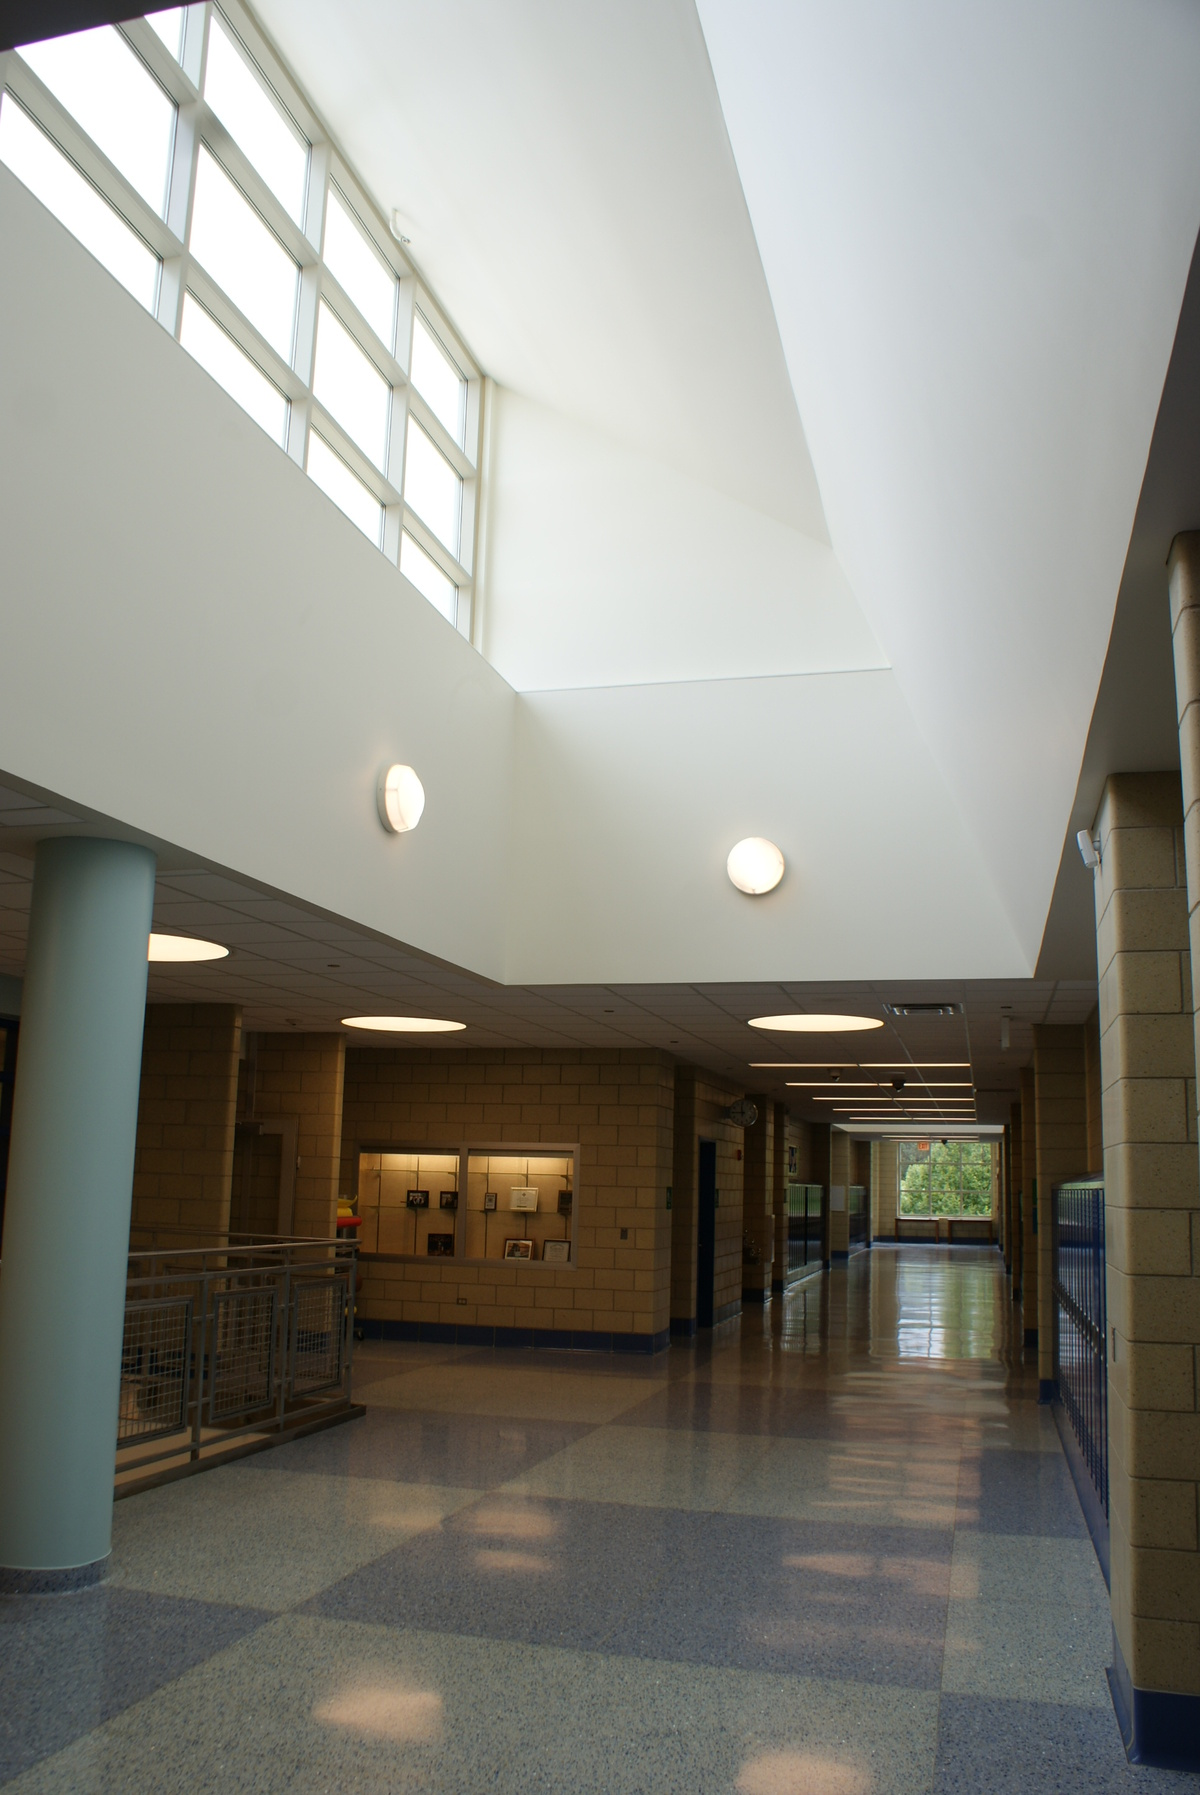 Interior View of Hallway Roof Monitors